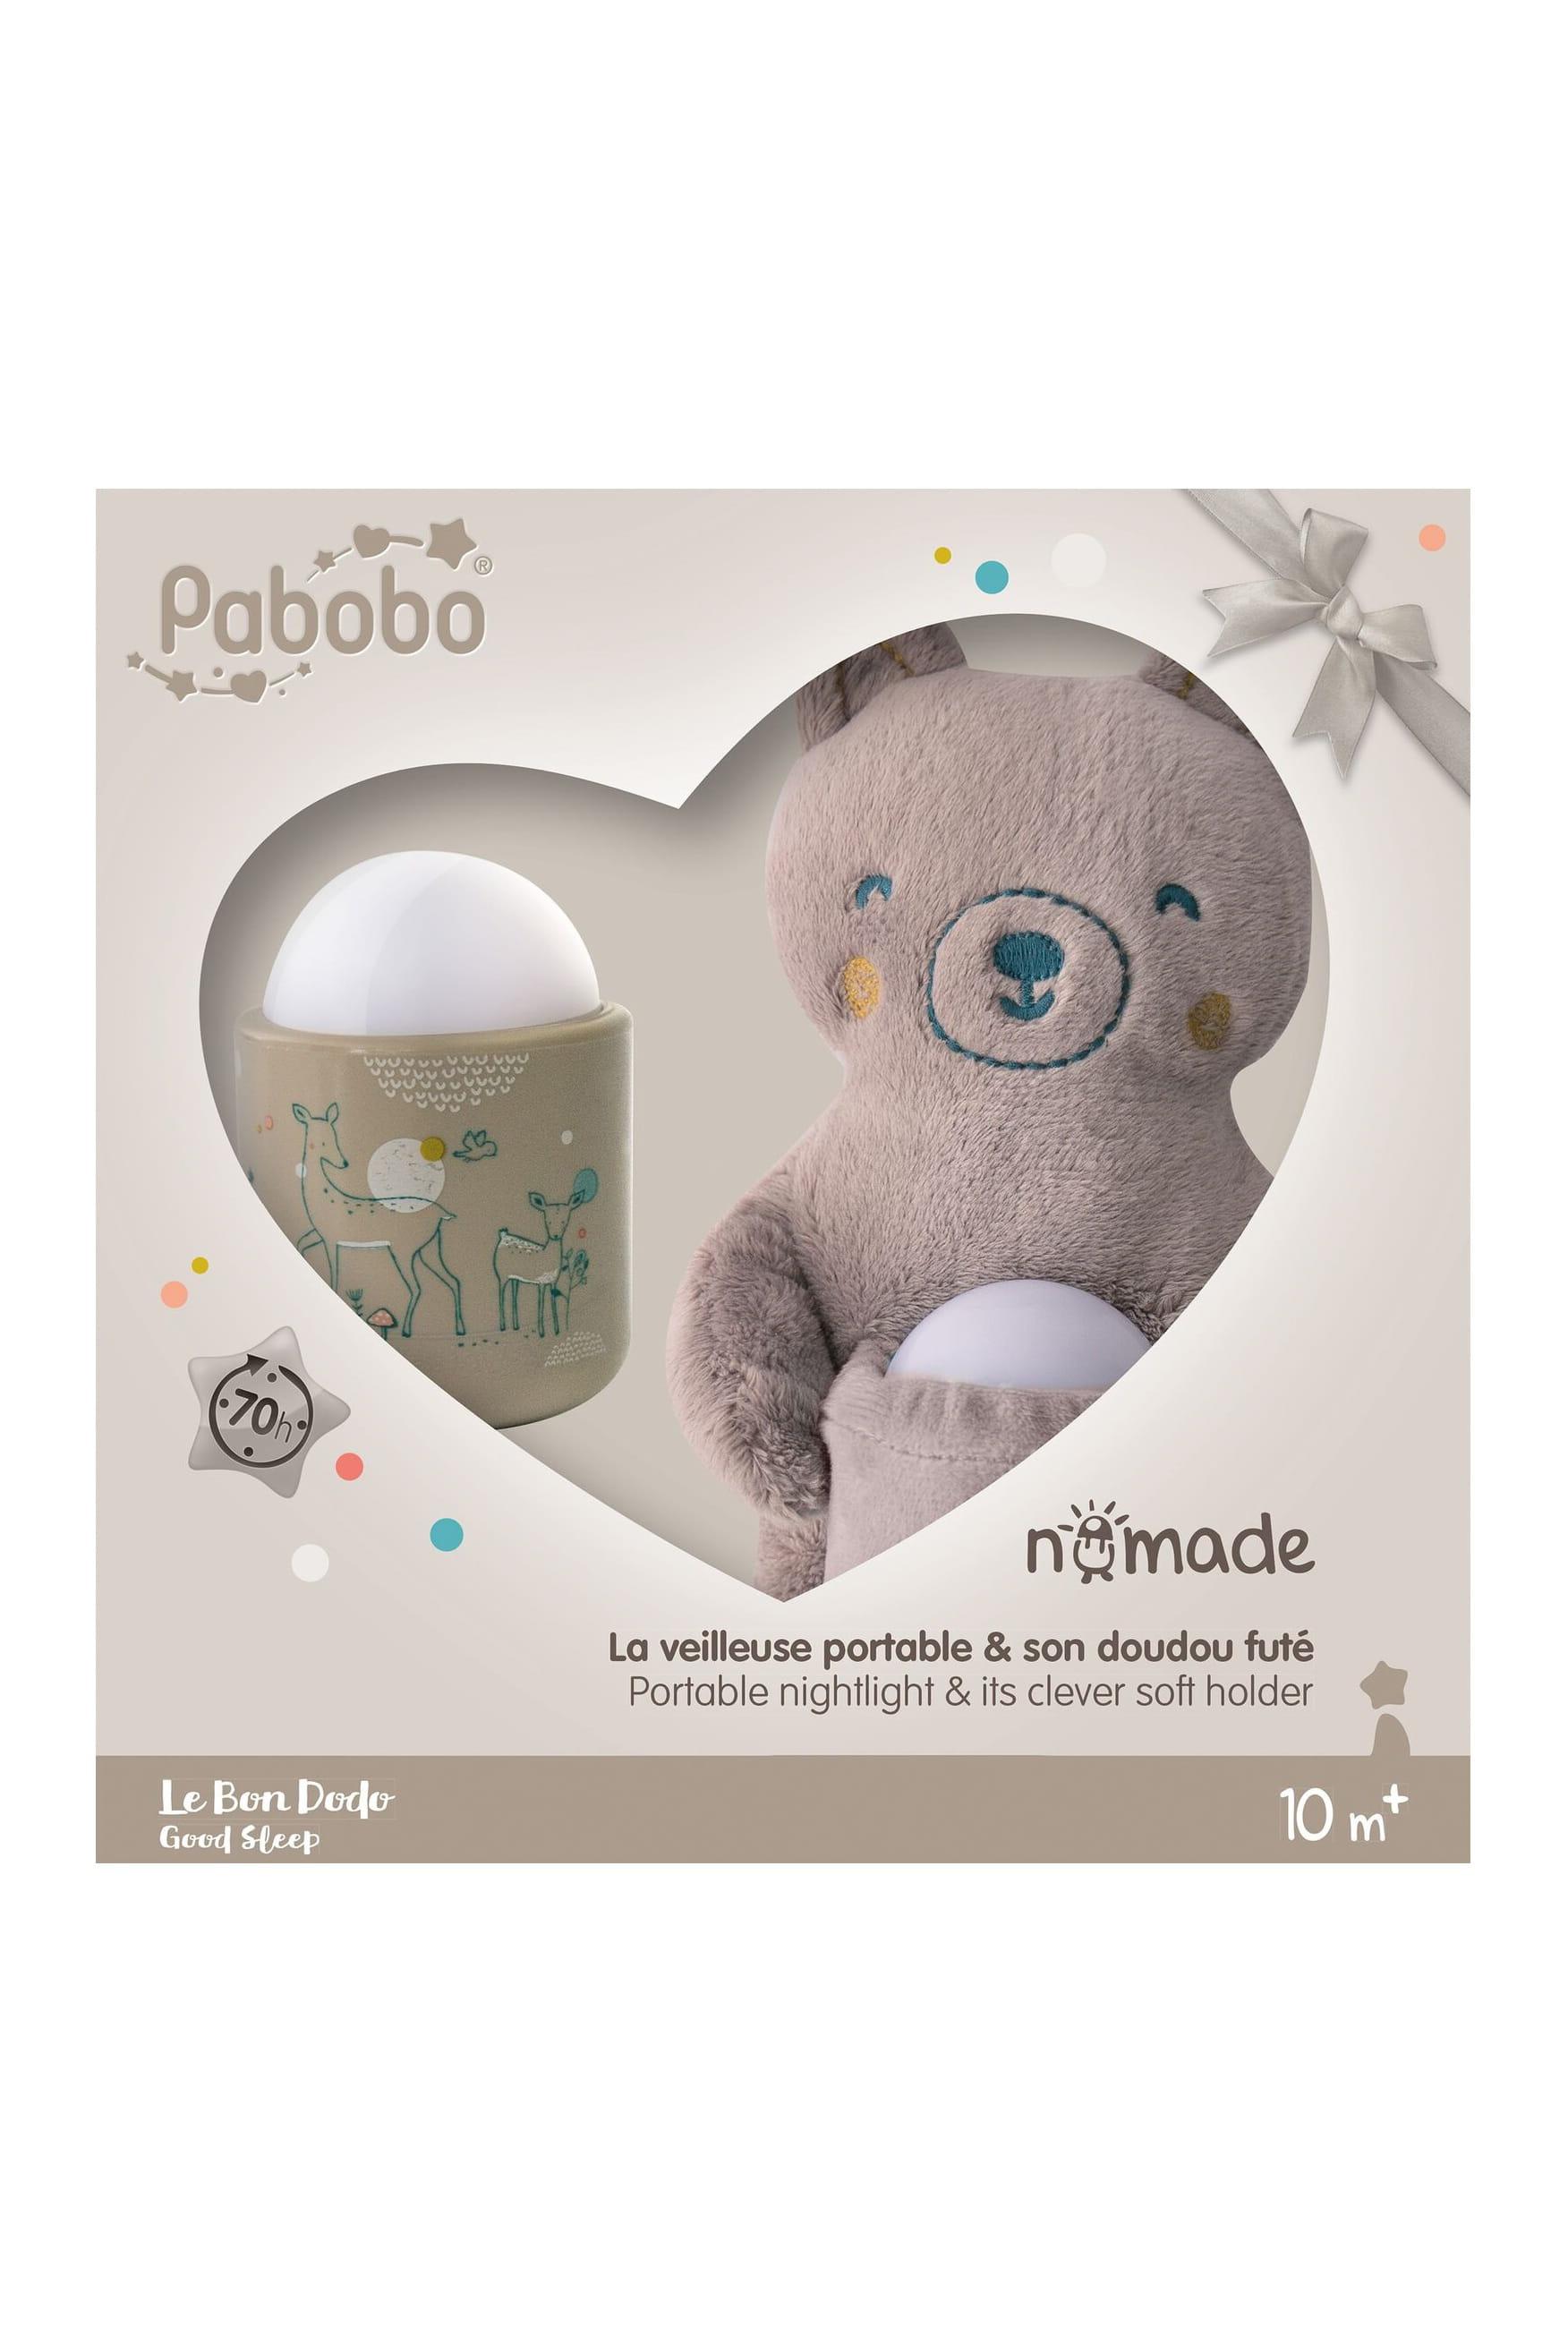 coffret cadeau veilleuse nomade pabobo. Black Bedroom Furniture Sets. Home Design Ideas